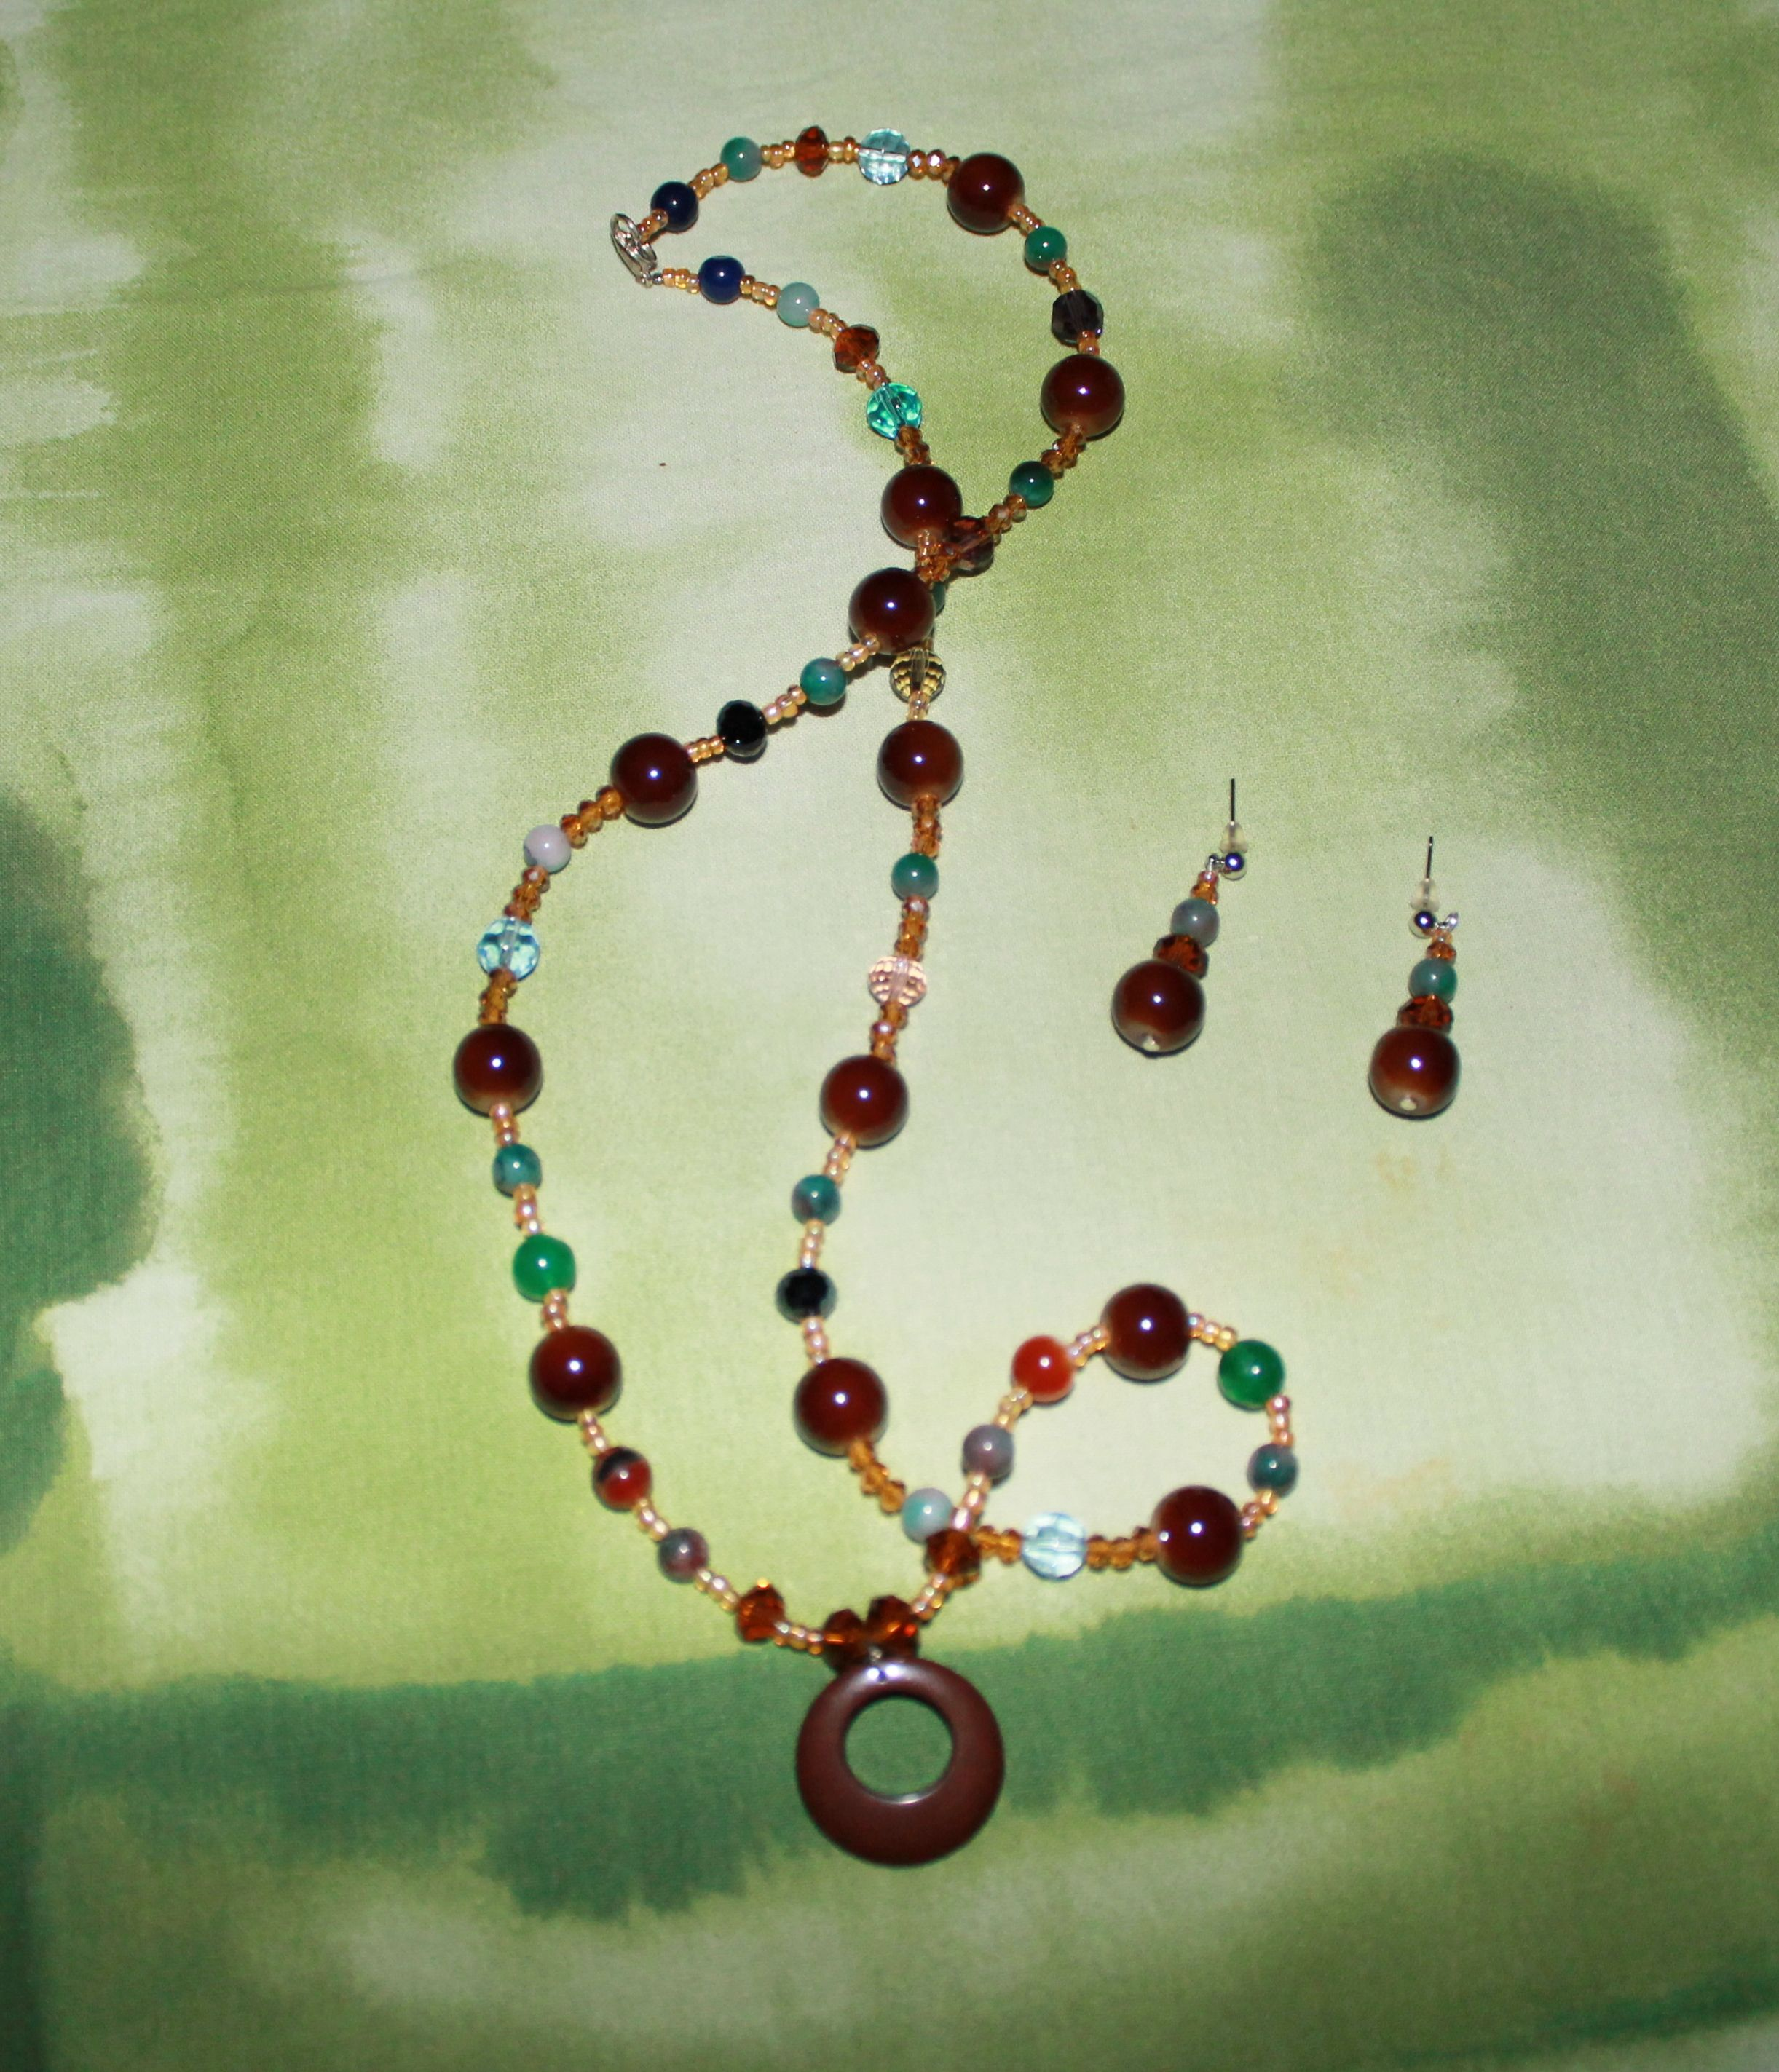 CA-002 Earrings included/Aretes incluidos/Orecchini inclusi/Boucles d'oreille inclus